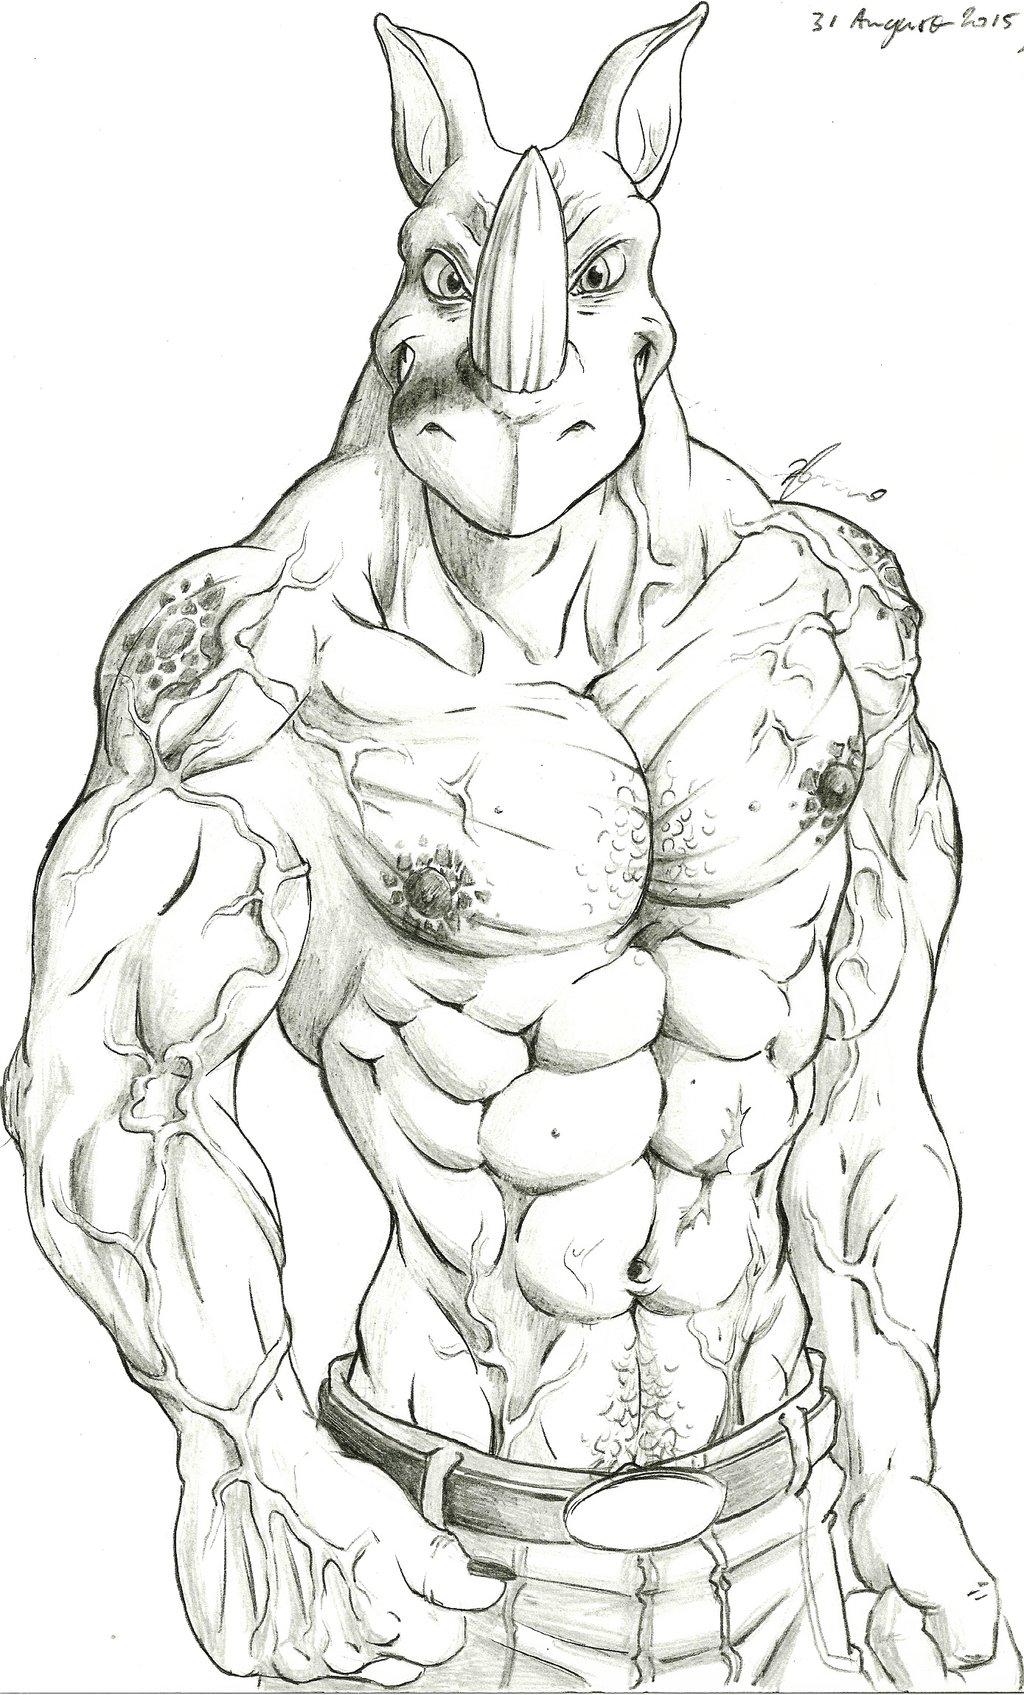 Drawn rhino muscular Kassanovas Muscle Kassanovas Muscle DeviantArt